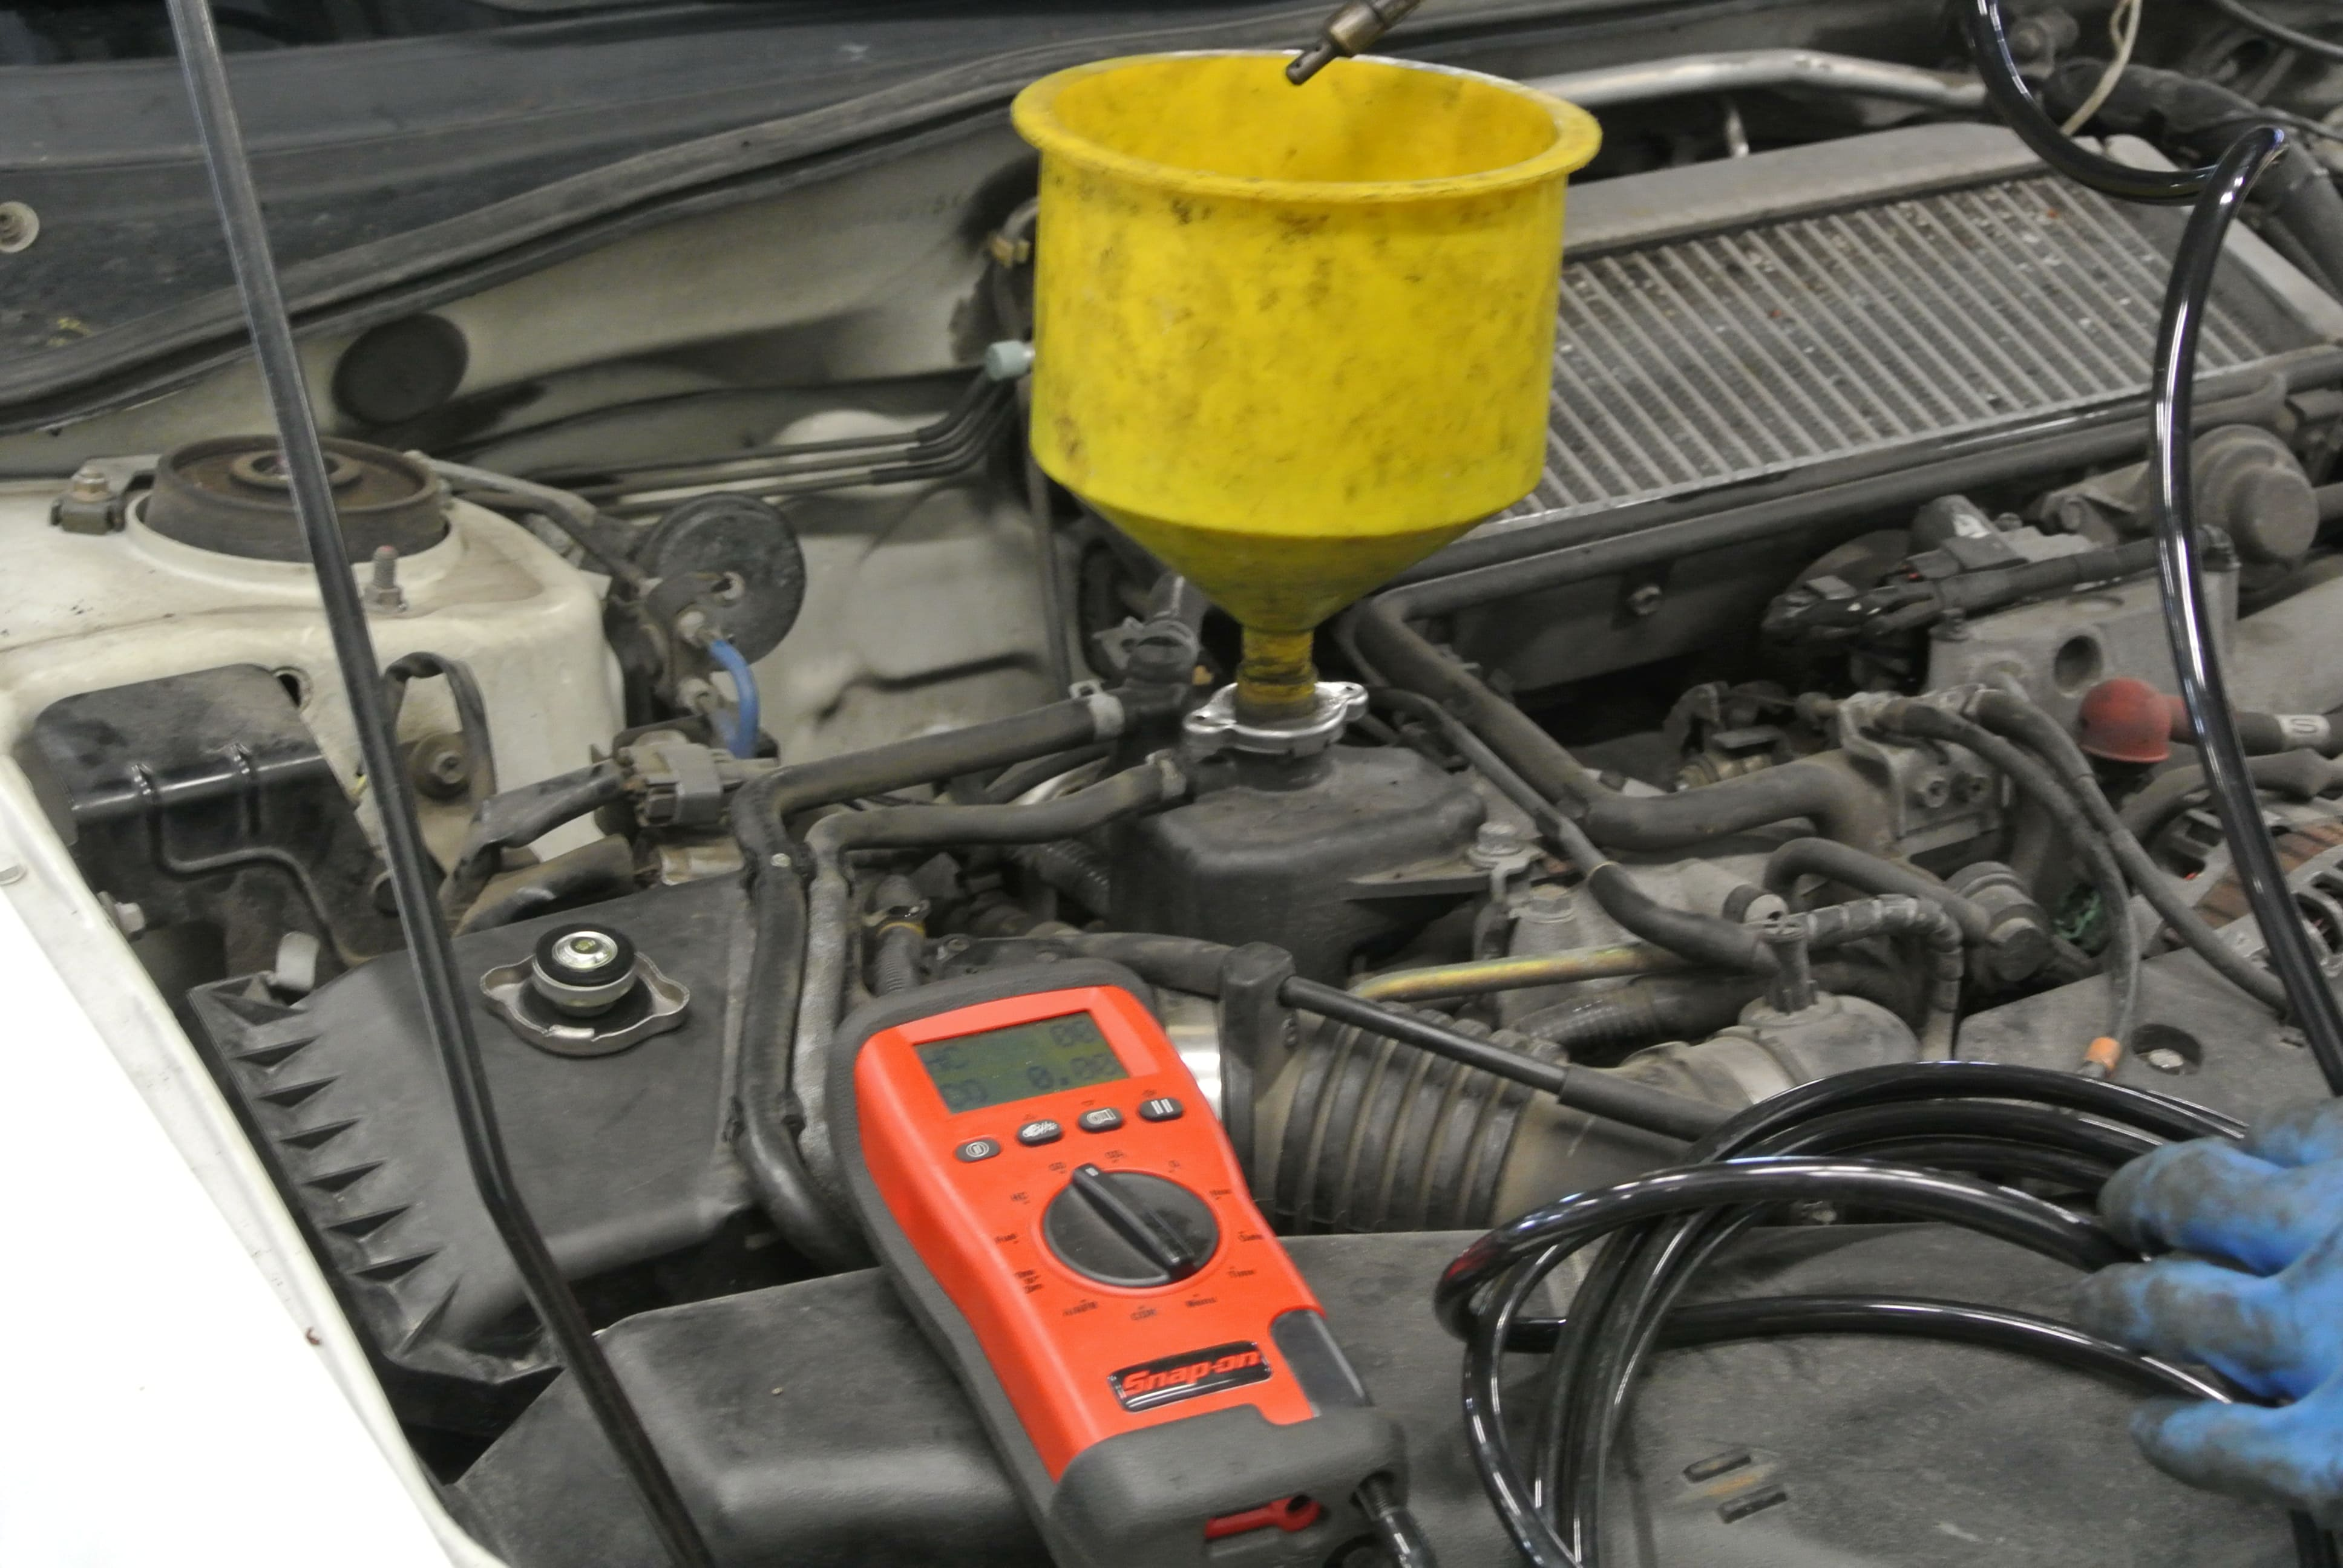 qo Gates Timing Belt Water Pump Kit for 2006-2008 Subaru Impreza 2.5L H4